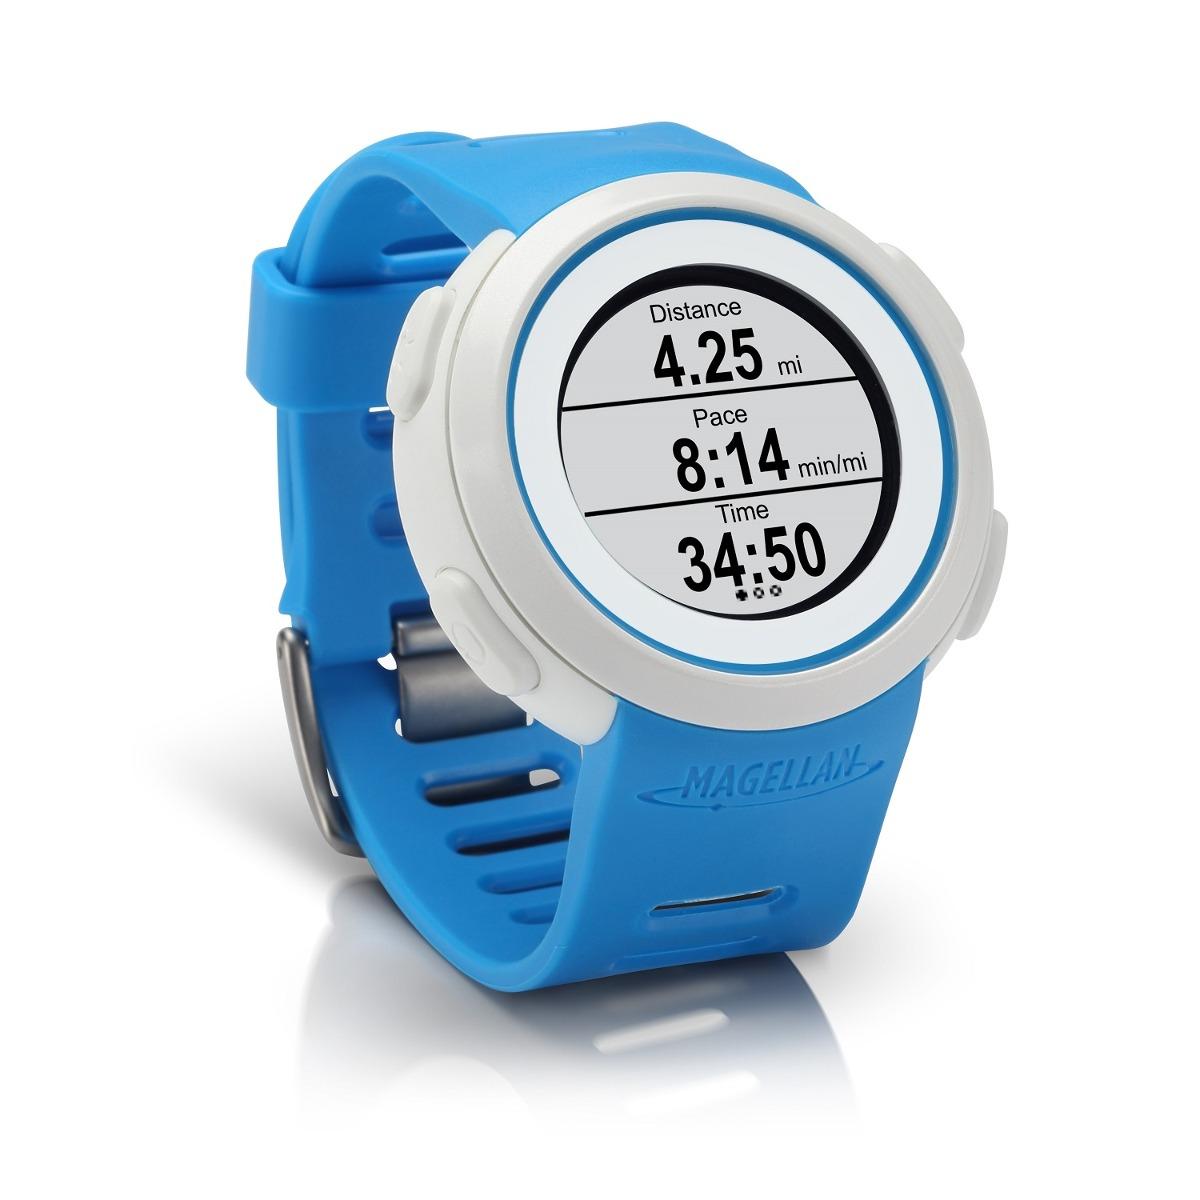 17a42b05e580 magallanes eco fit reloj deportivo azul. Cargando zoom.